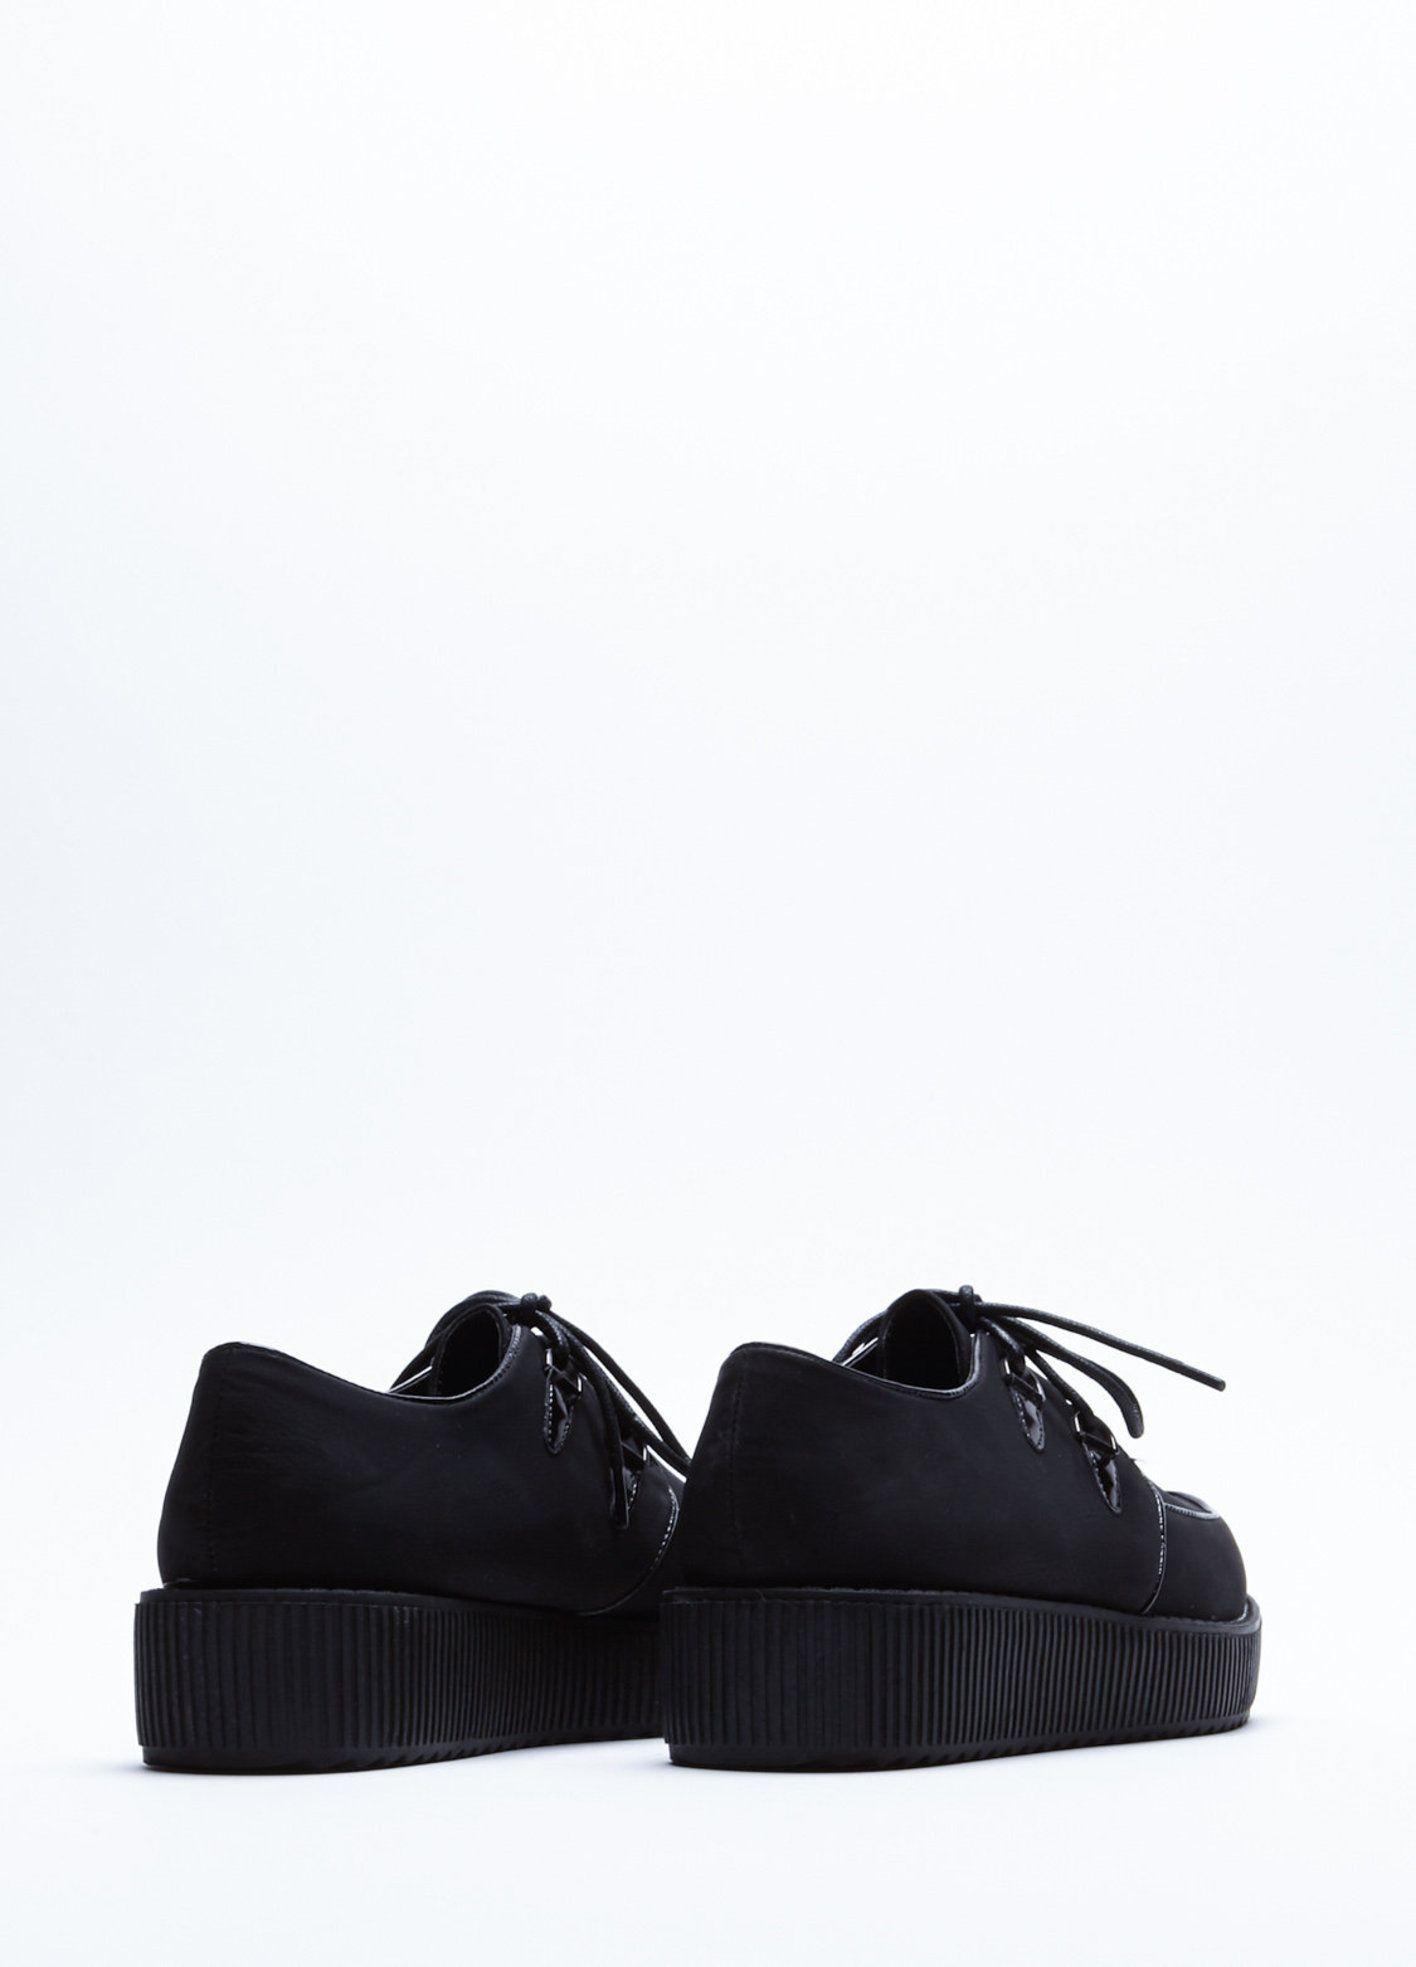 Iris Shoe - Women's shoes | Wasteland